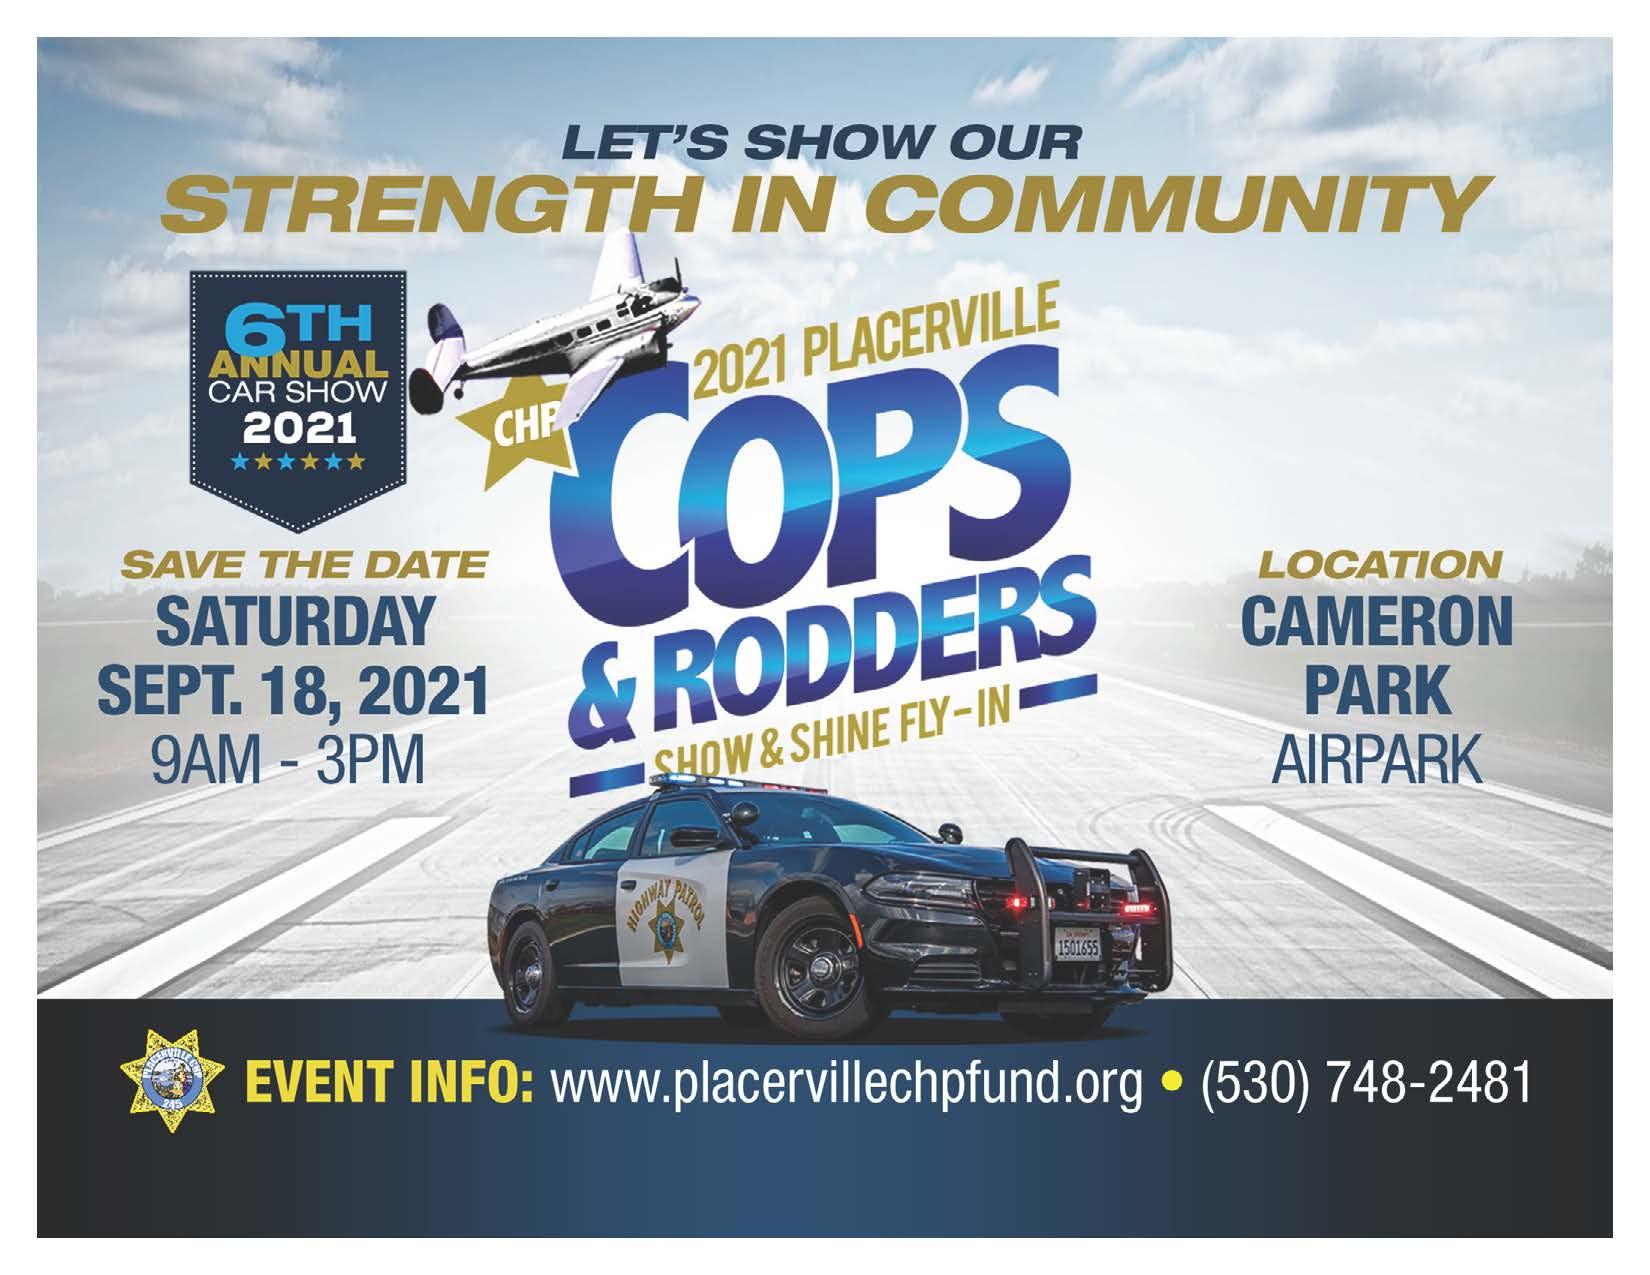 Cops & Rodders Show & Shine